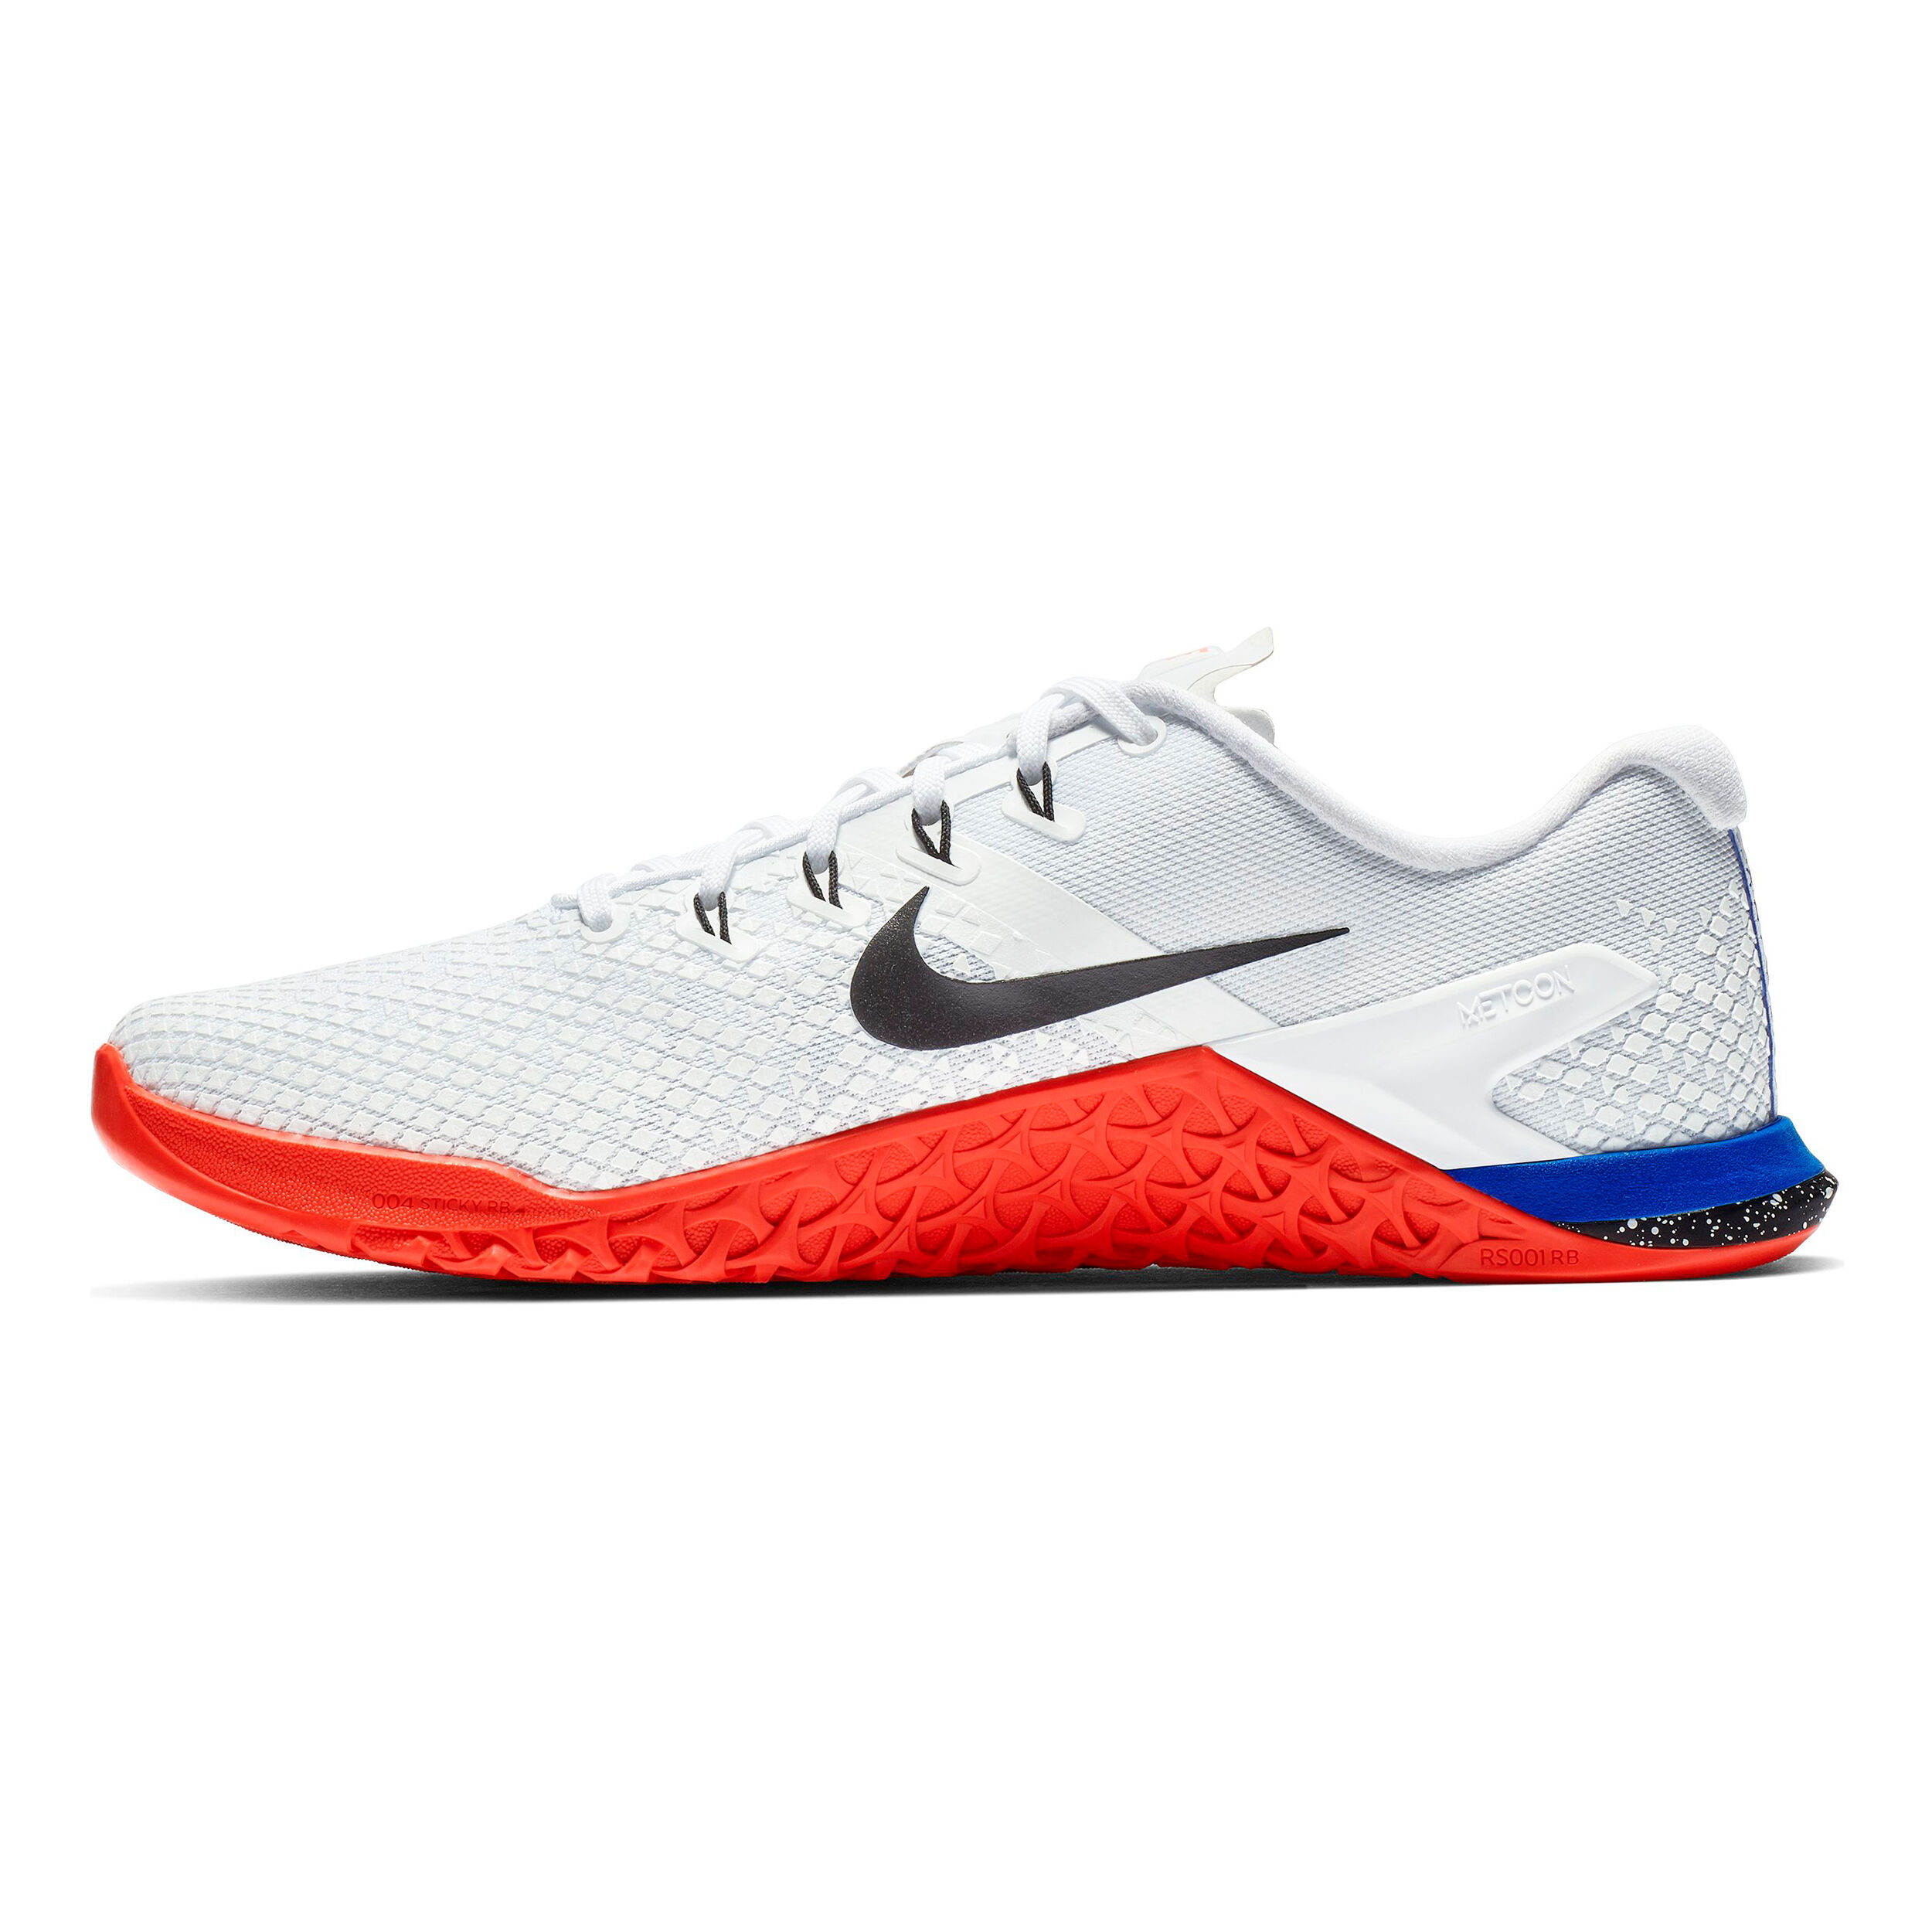 Nike Metcon 4 XD Metallic Shoes Grey Pink | Zapatos de